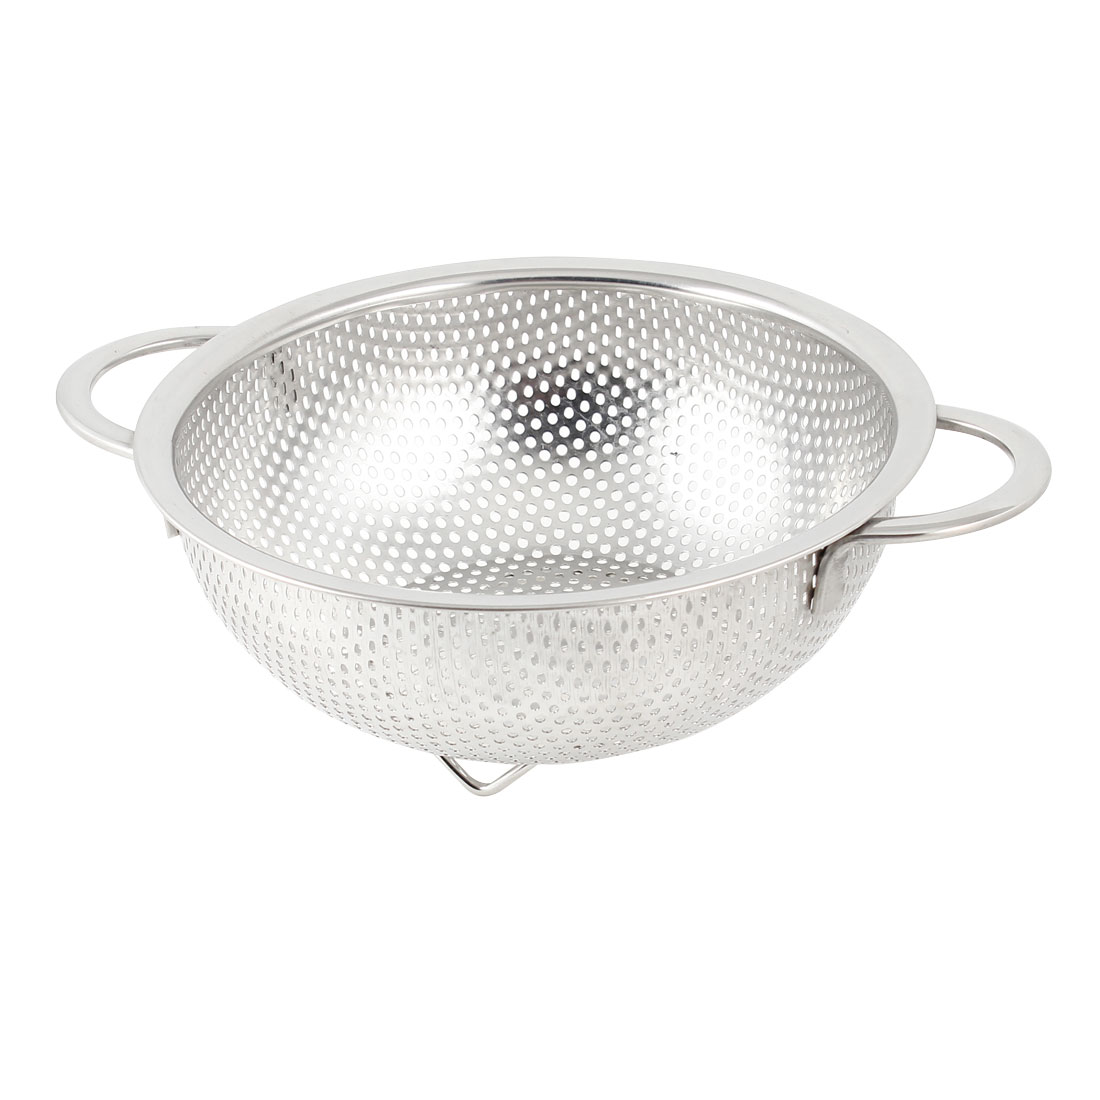 20cm Diameter Silver Tone Stainless Steel Fruit Basket